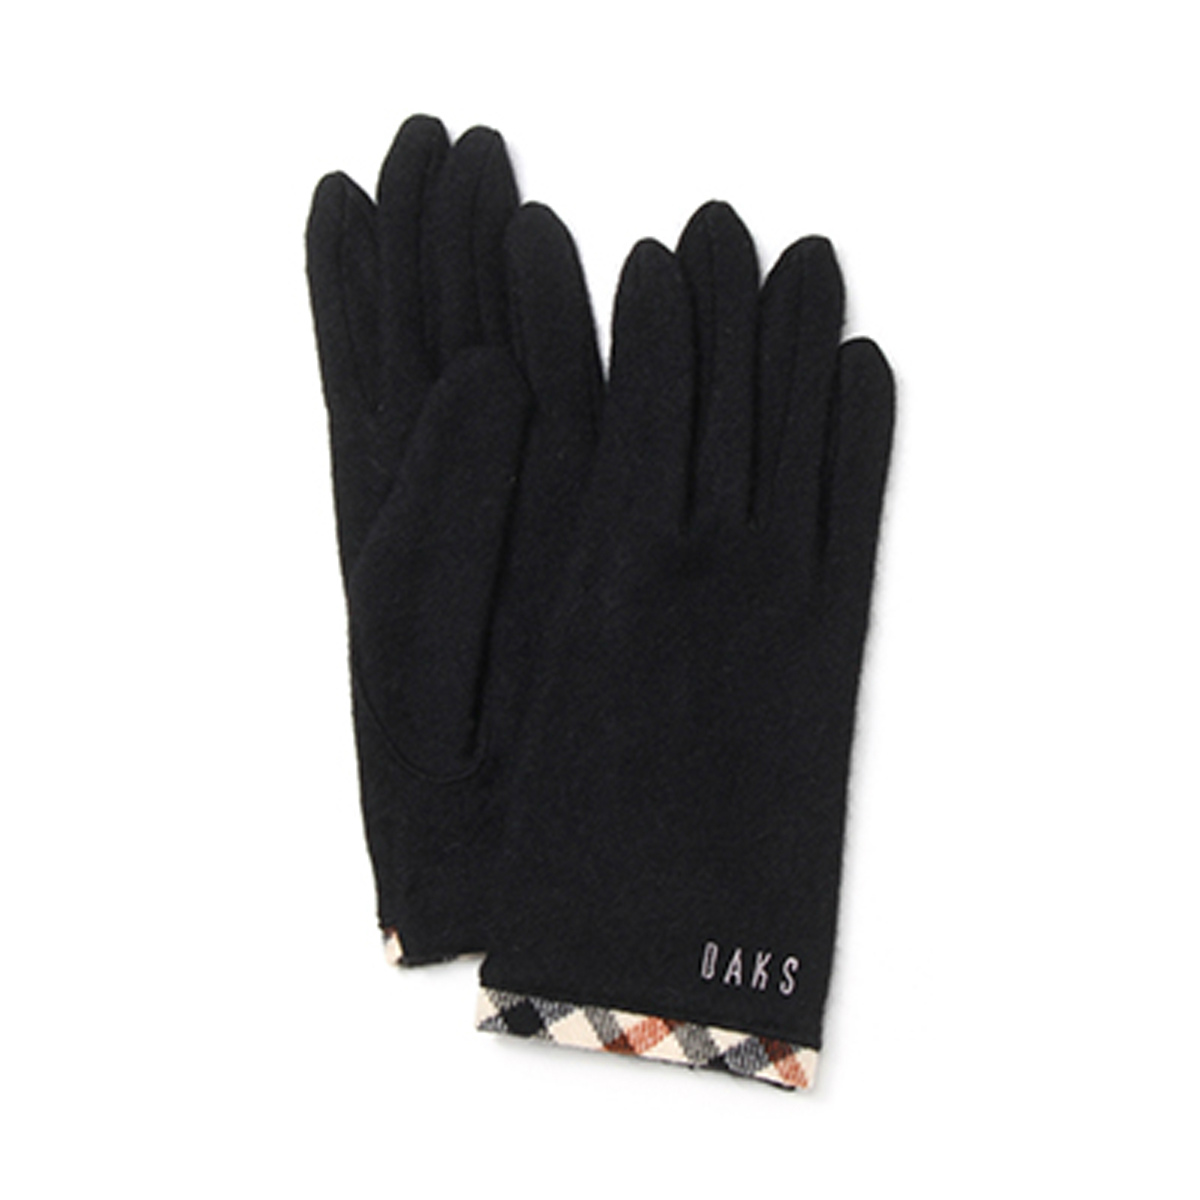 【SALE】DAKS ロゴ刺繍入り ハウスチェックパイピング裾 カシミヤ100% ジャージ レディース手袋 日本製 Mサイズ 全4色